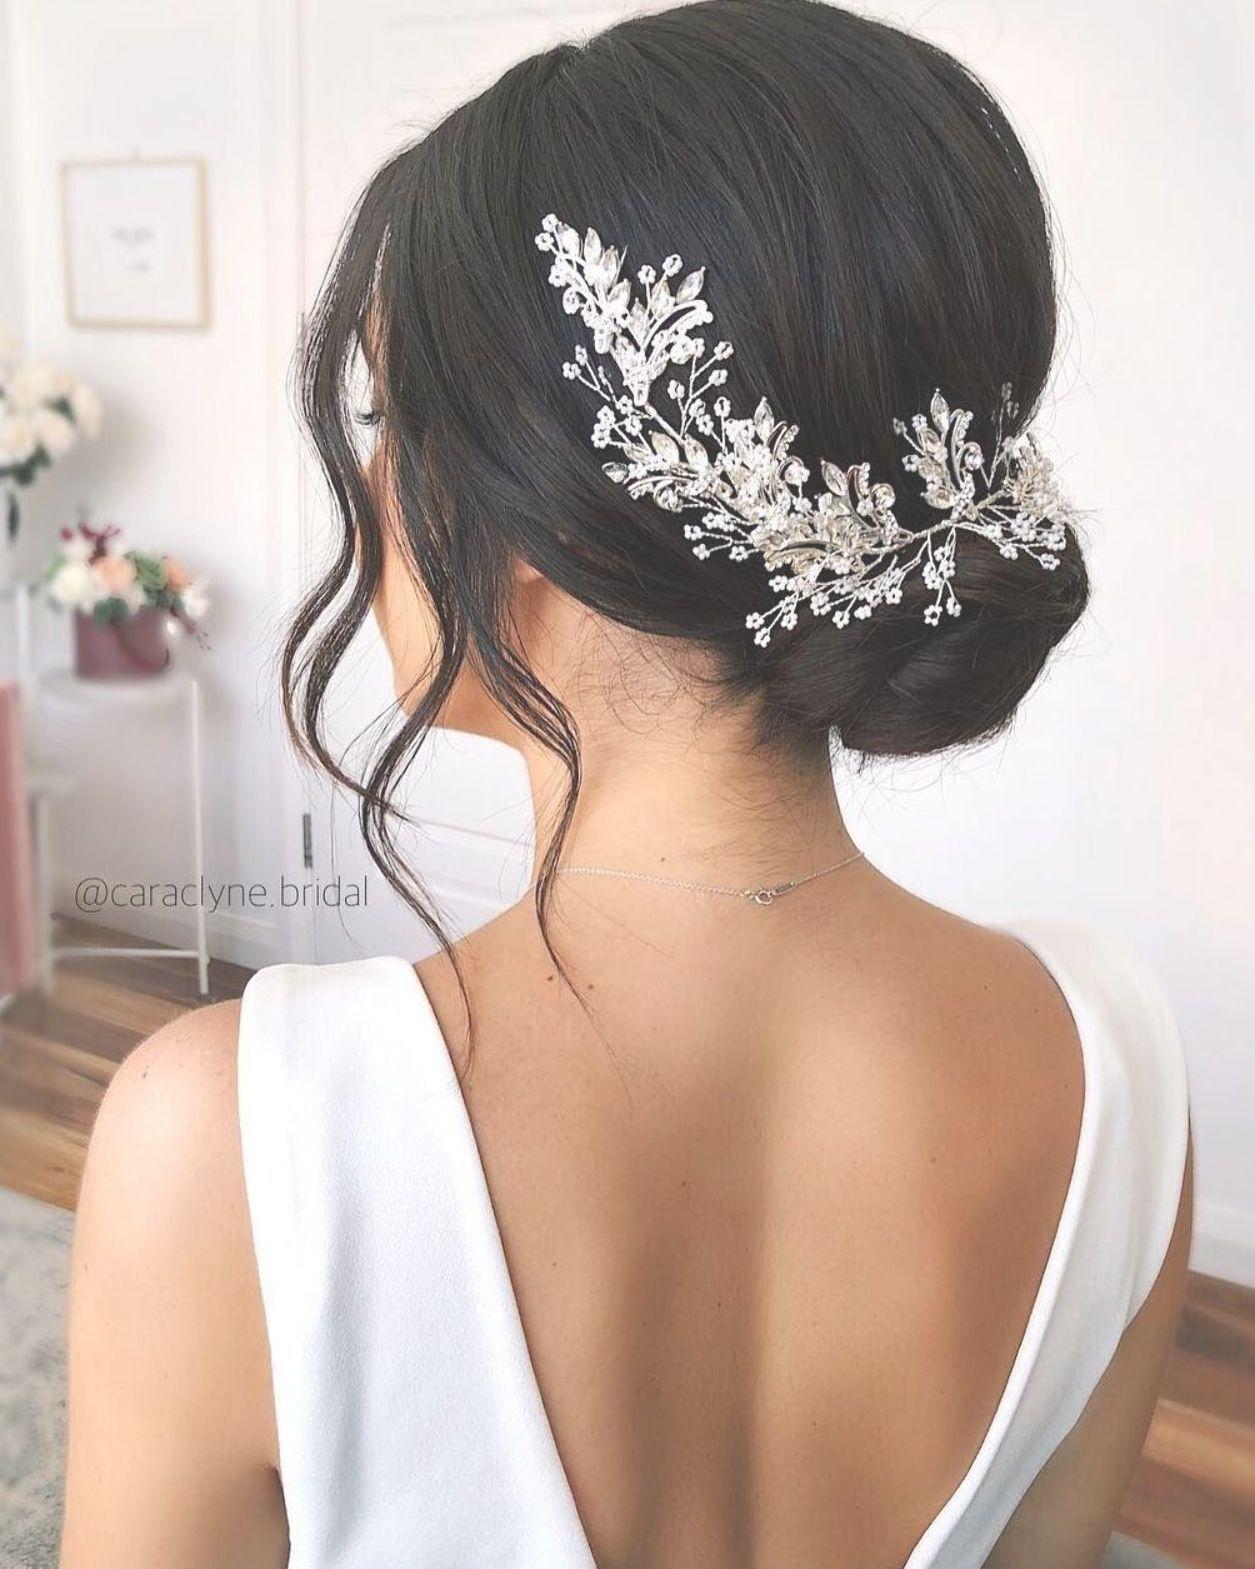 Sydney Wedding Hair Stylist On Instagram Beautiful Updo On Dark Hair Accessories Selena By Wedding Hairstyles Bride Bride Hairstyles Hair Vine Wedding